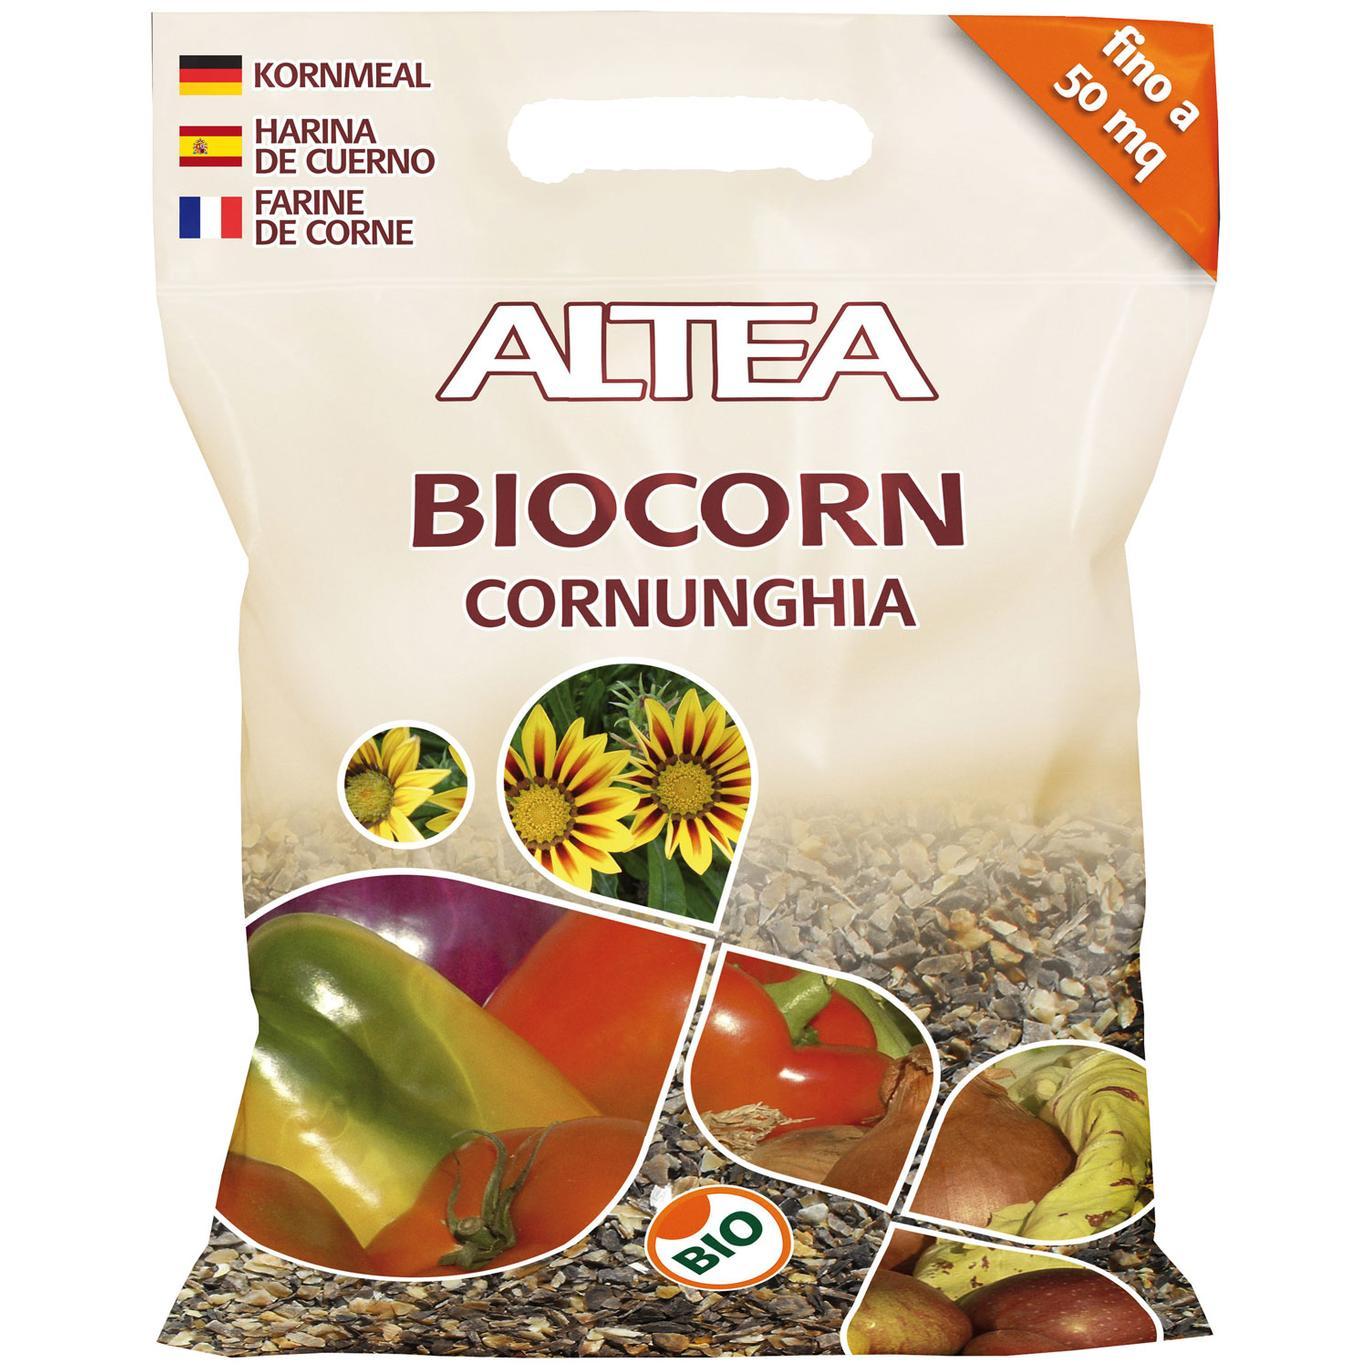 Altea BIOCORN CORNUNGHIA naturale kg2,5 in scaglie concime organico BIO